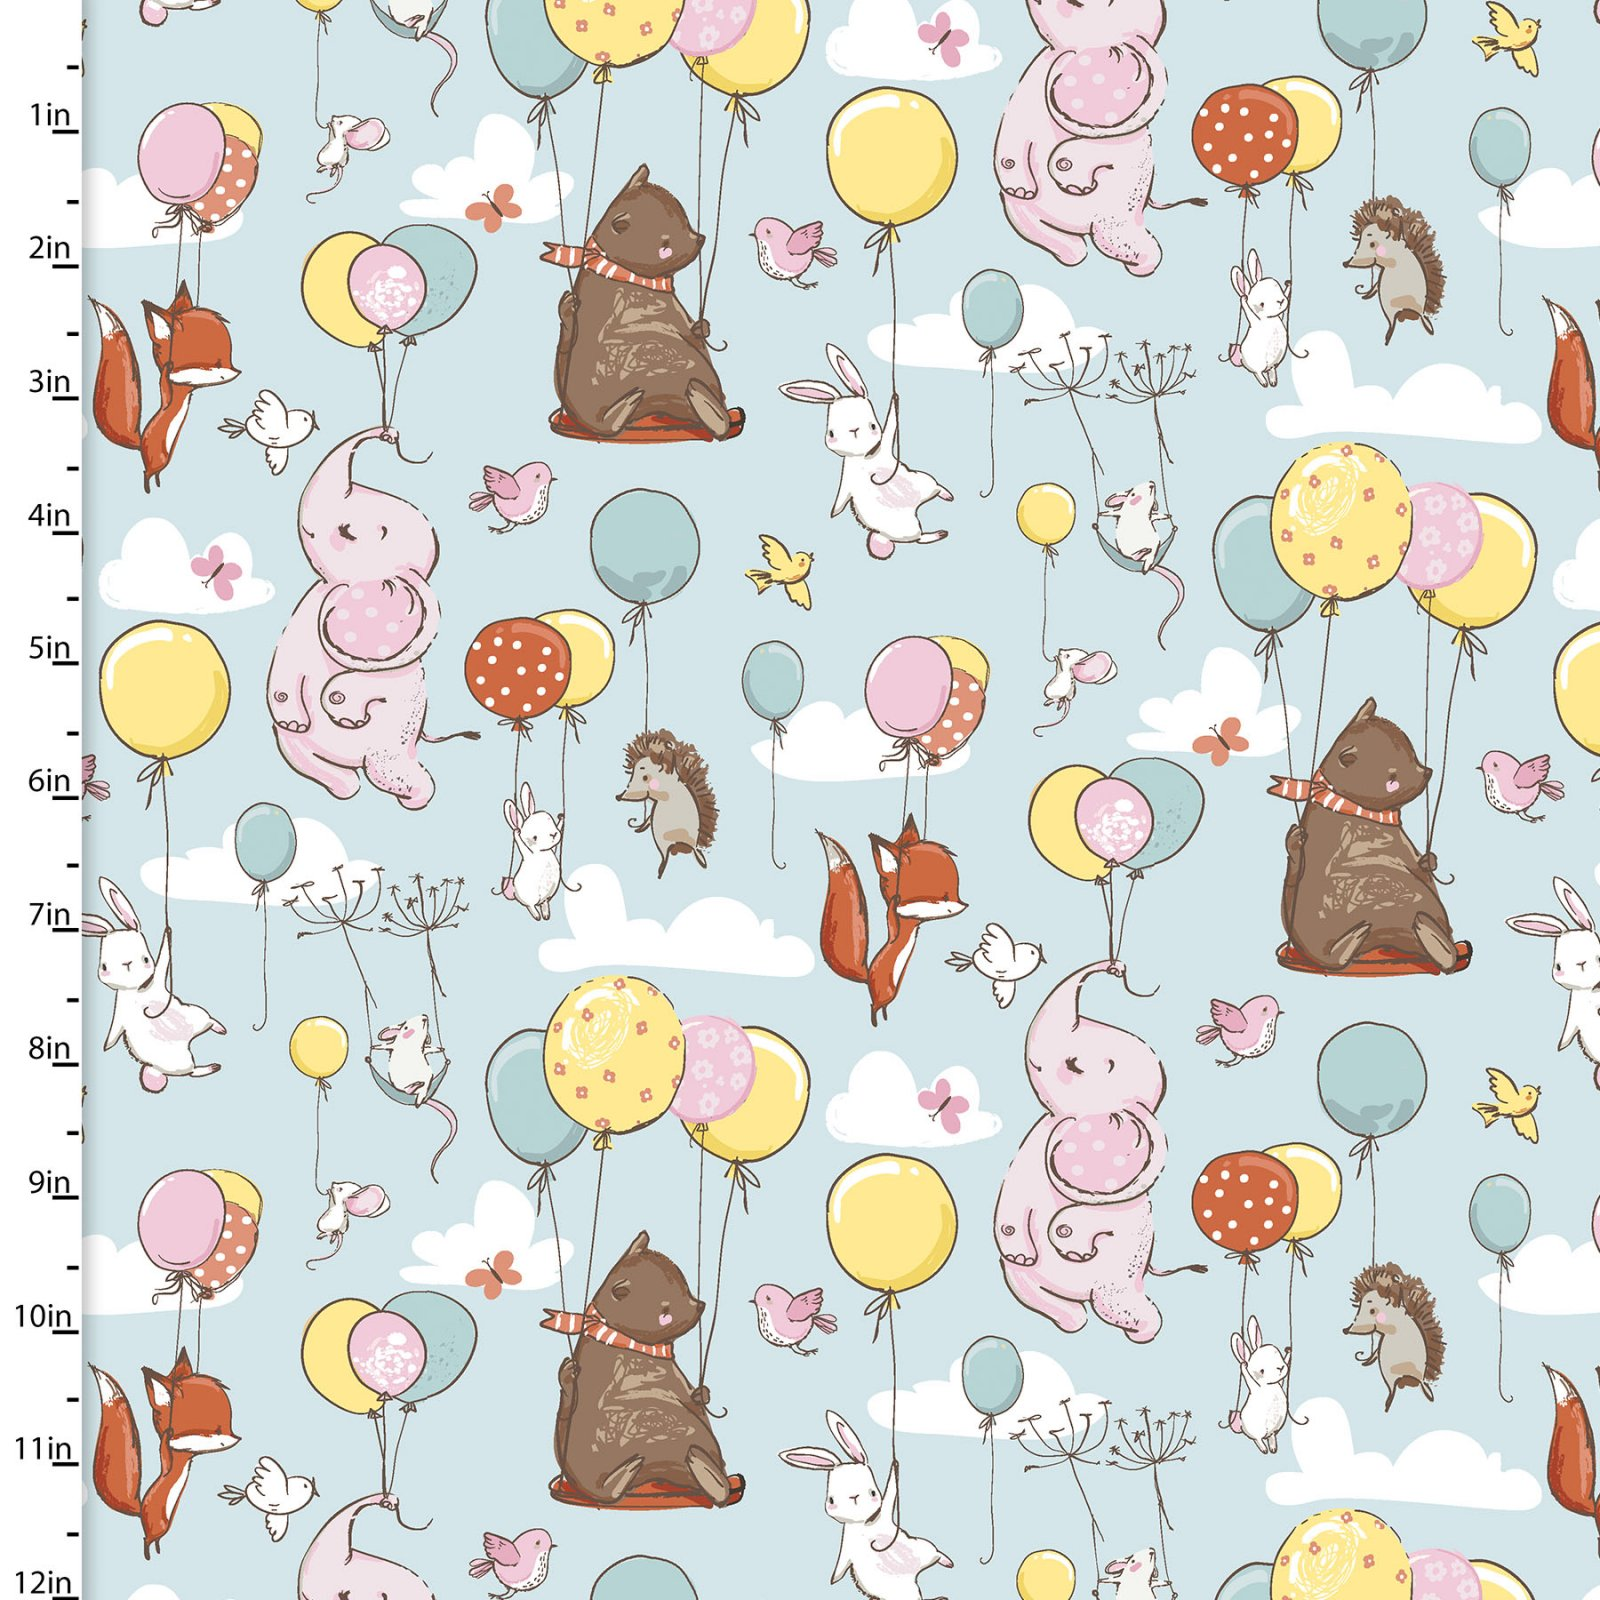 Playful Cuties 3 - Flying High Flannel